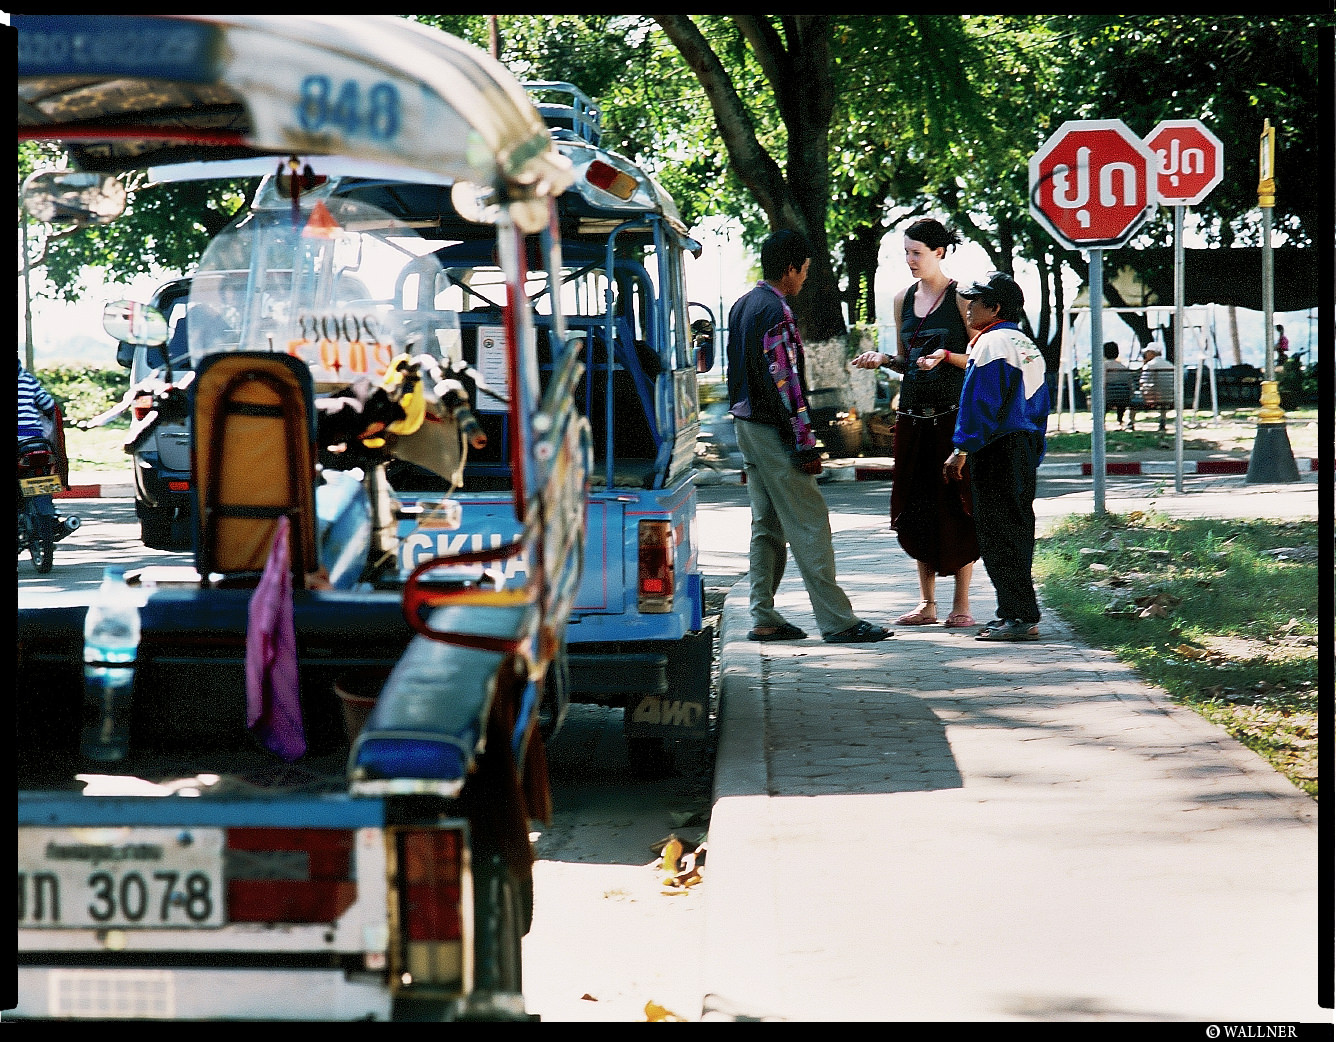 MediumFormatPatrikWallner_Vientiane_TuckTubBargainLOWQ